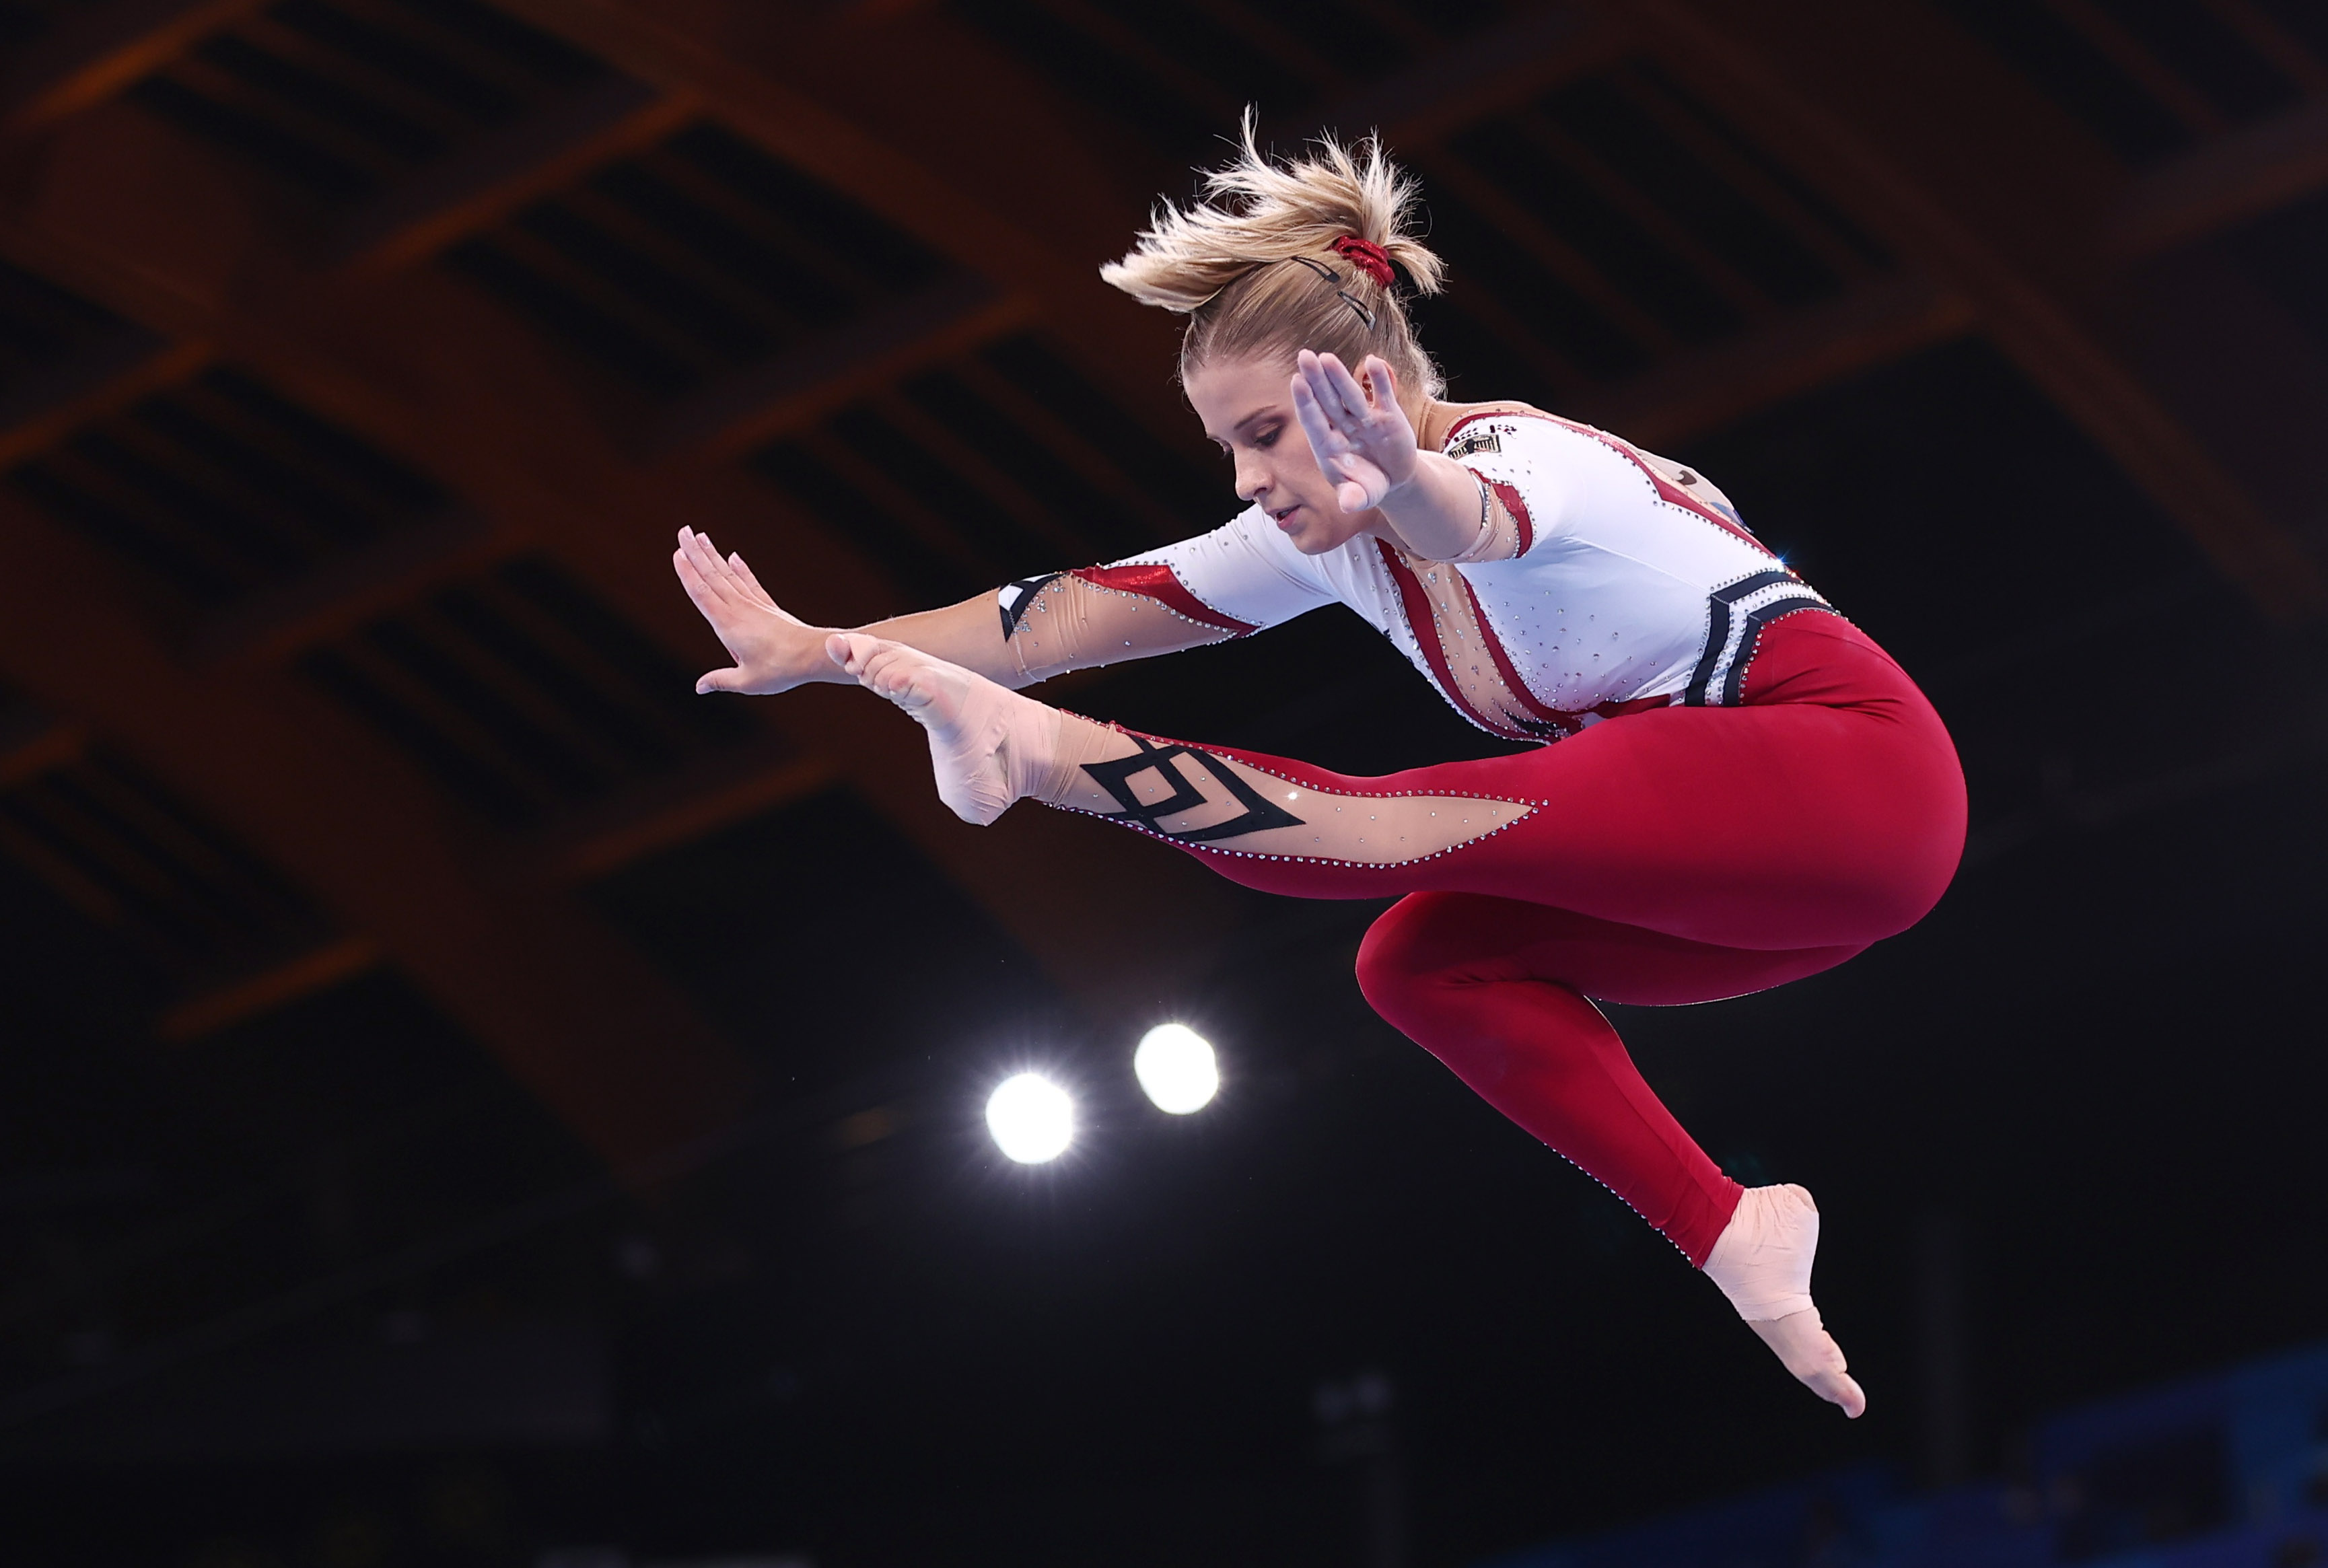 Tokyo 2020 Olympics - Gymnastics - Artistic - Women's Beam - Qualification - Ariake Gymnastics Centre, Tokyo, Japan - July 25, 2021. Elisabeth Seitz of Germany in action on the balance beam REUTERS/Mike Blake